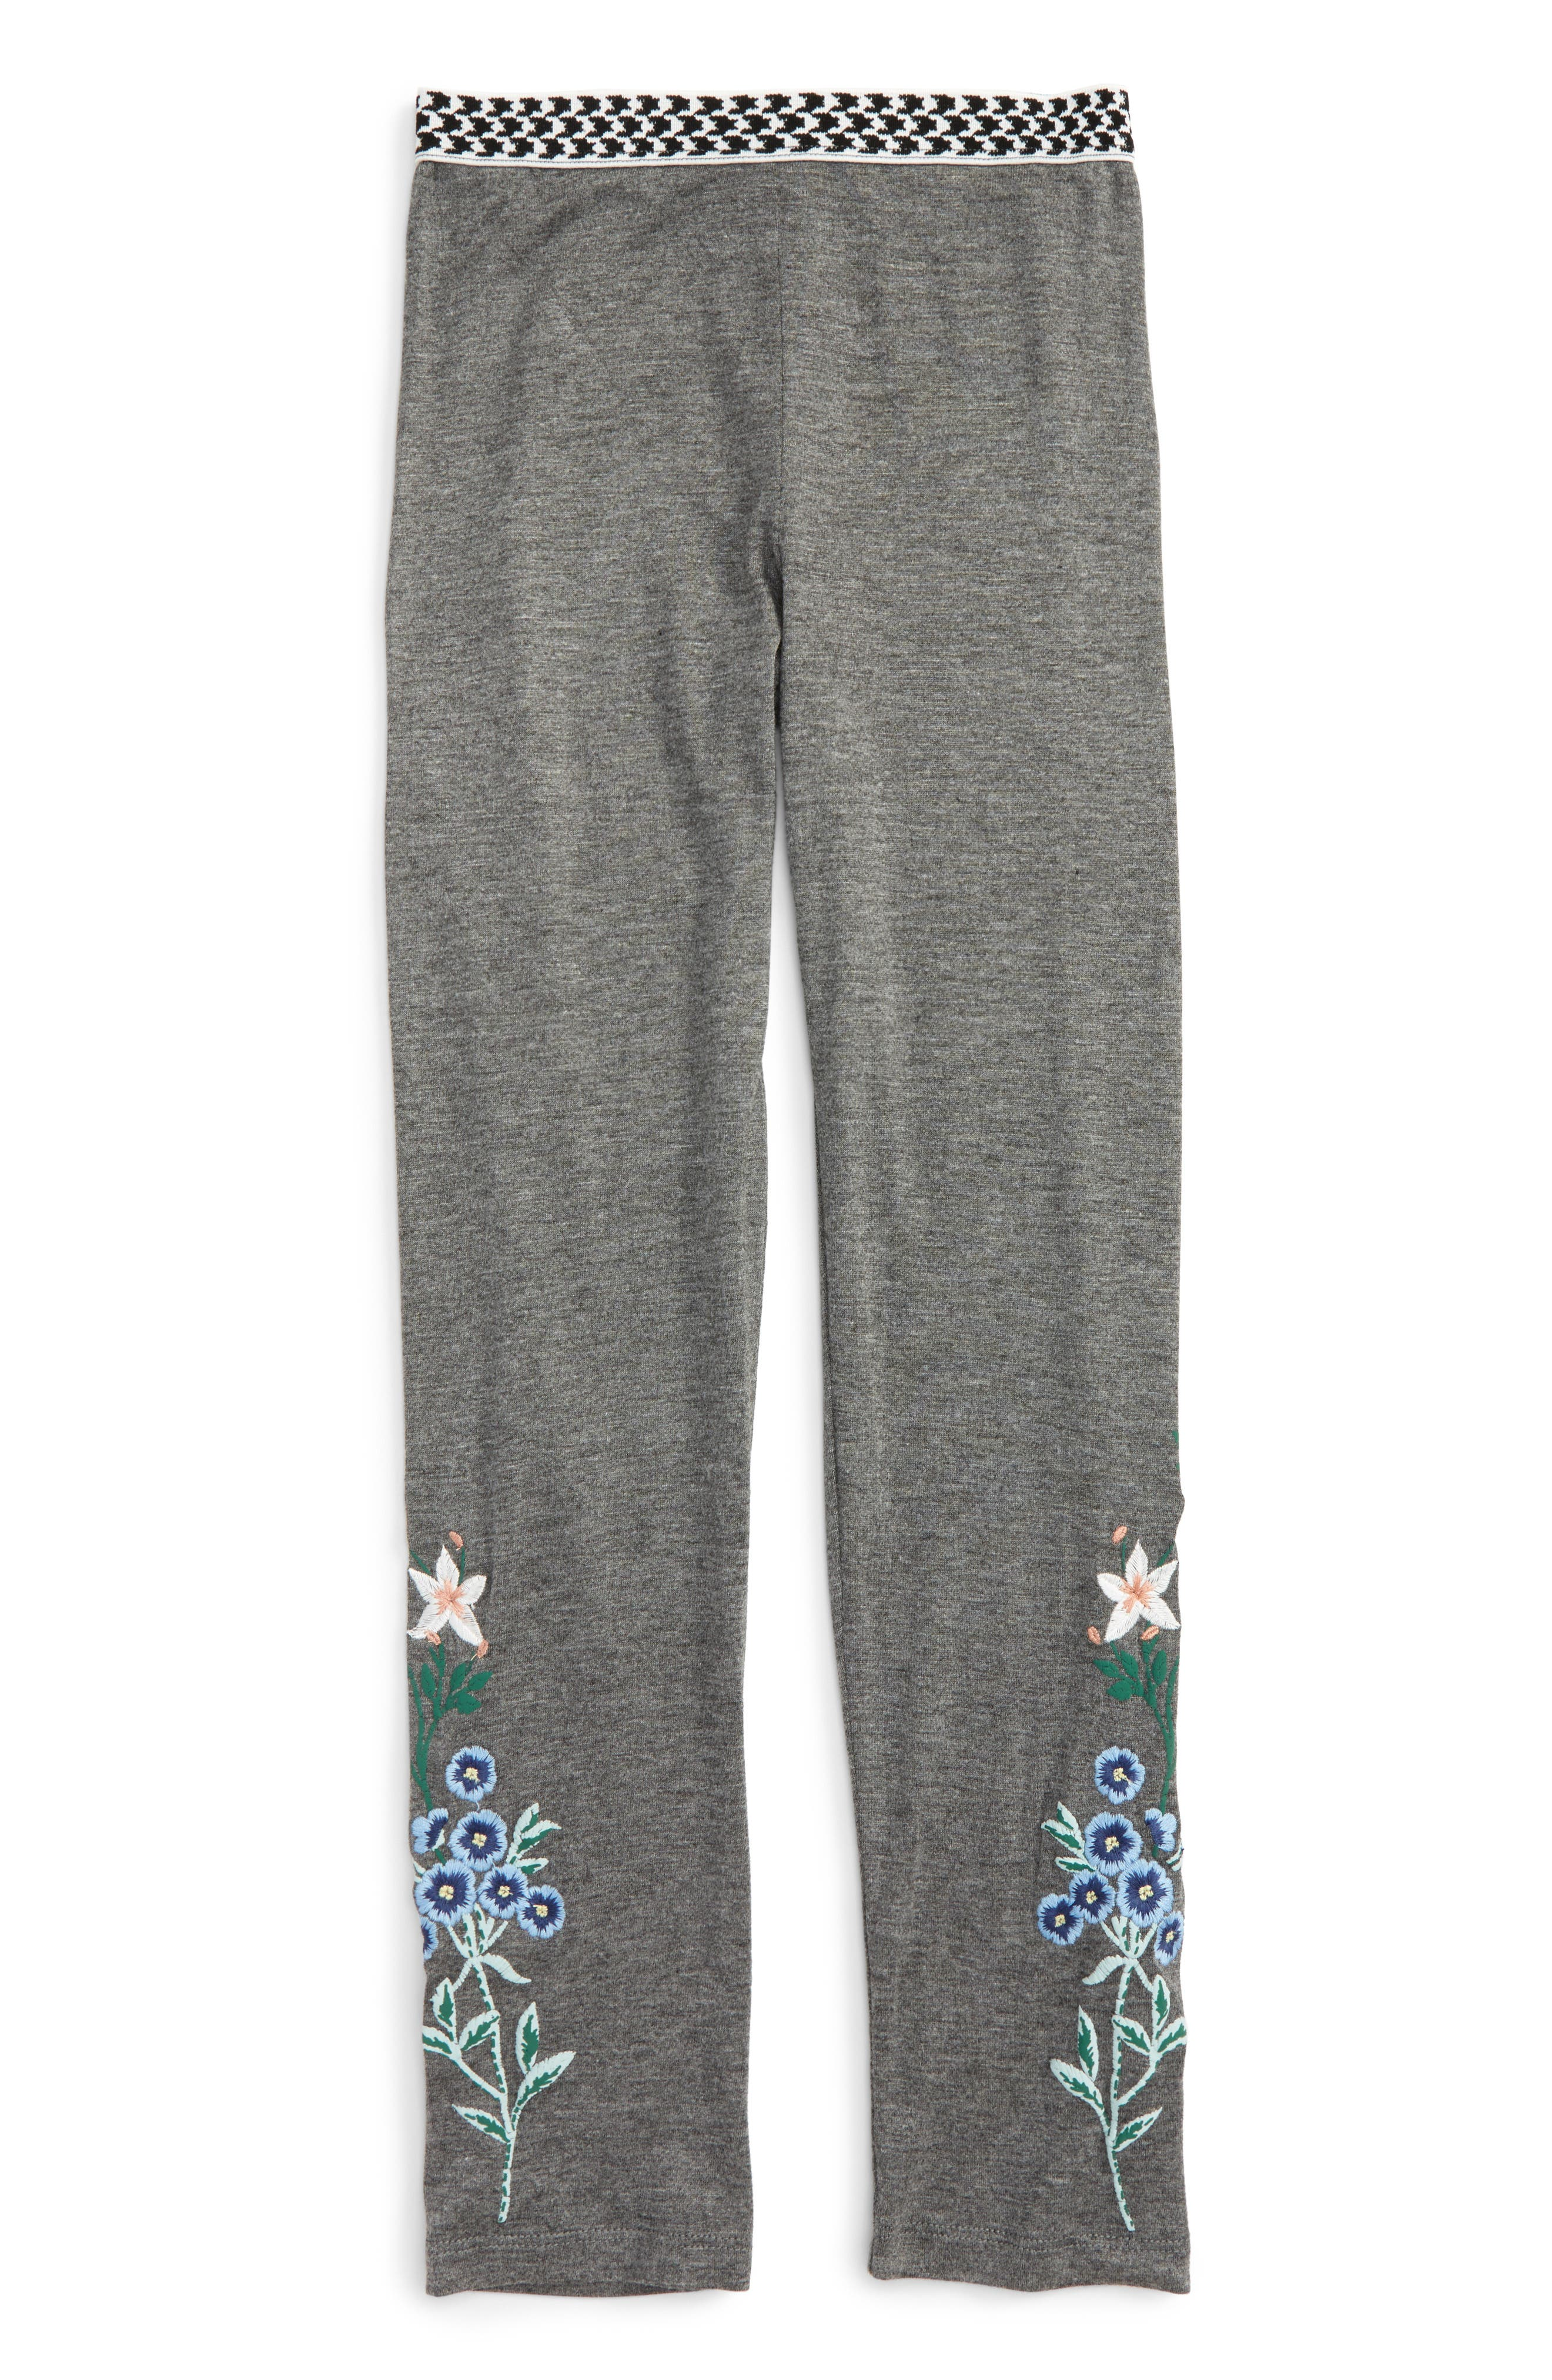 Embroidered Leggings,                         Main,                         color, Dark Grey